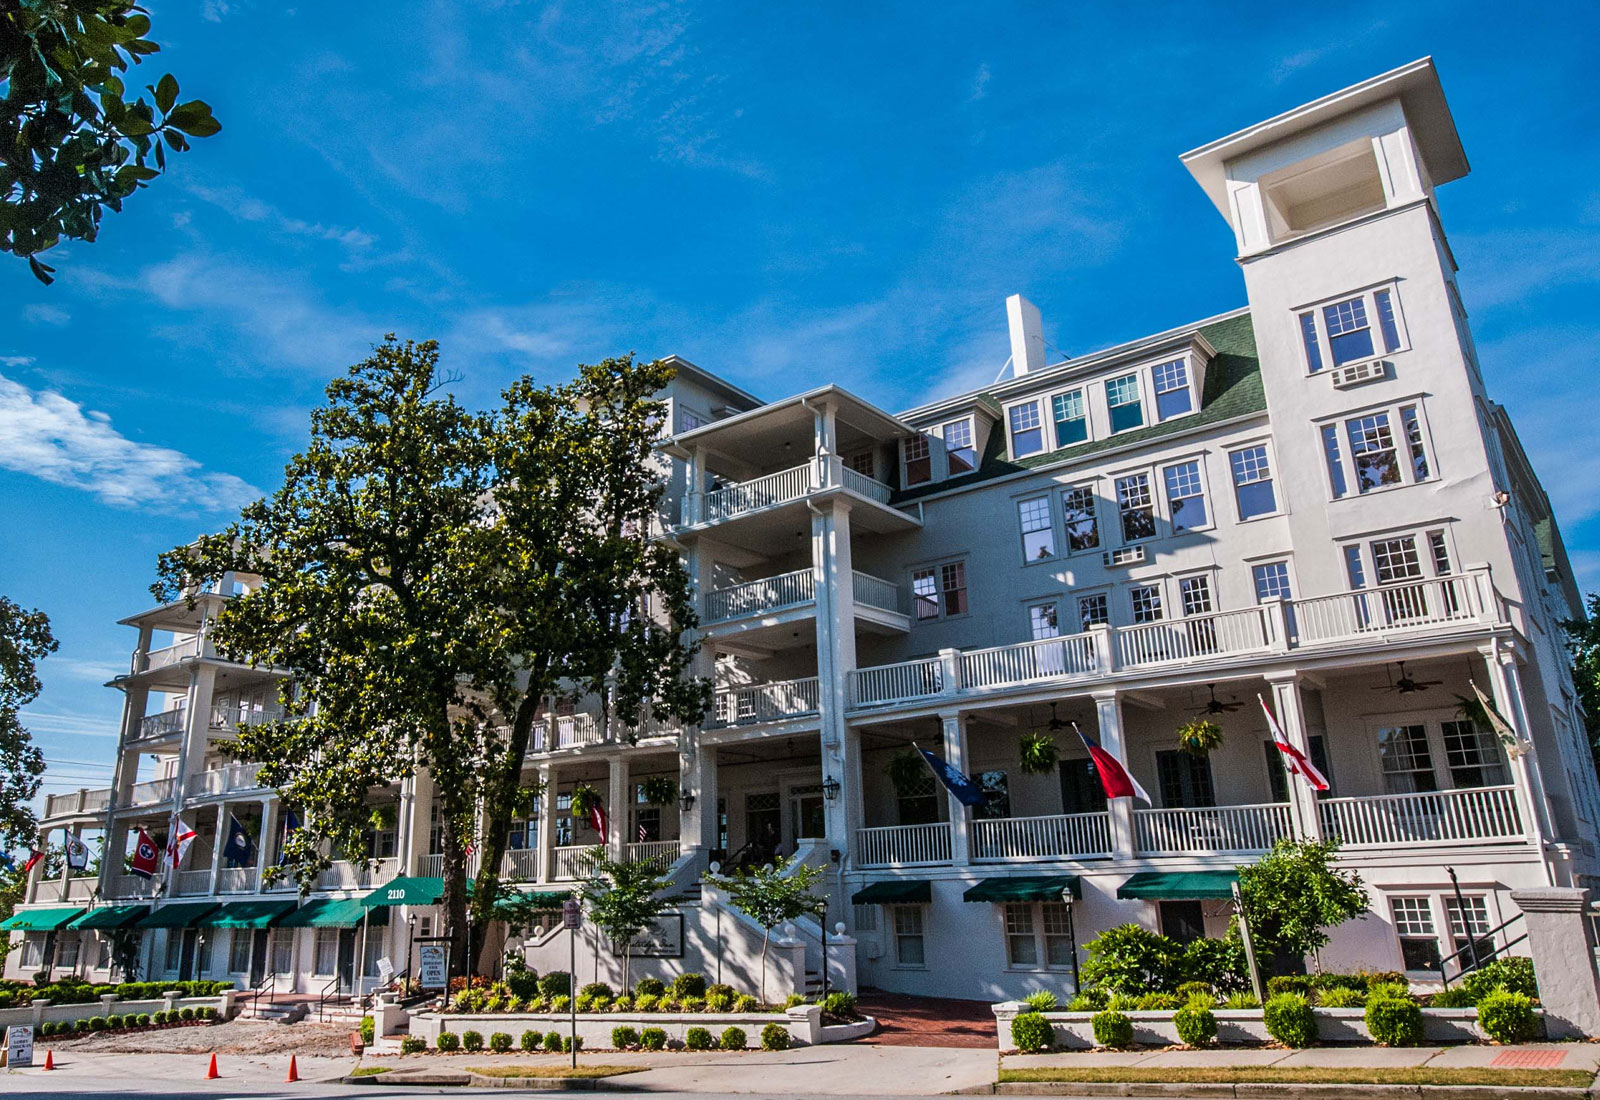 Historic The Partridge Inn Augusta hotel